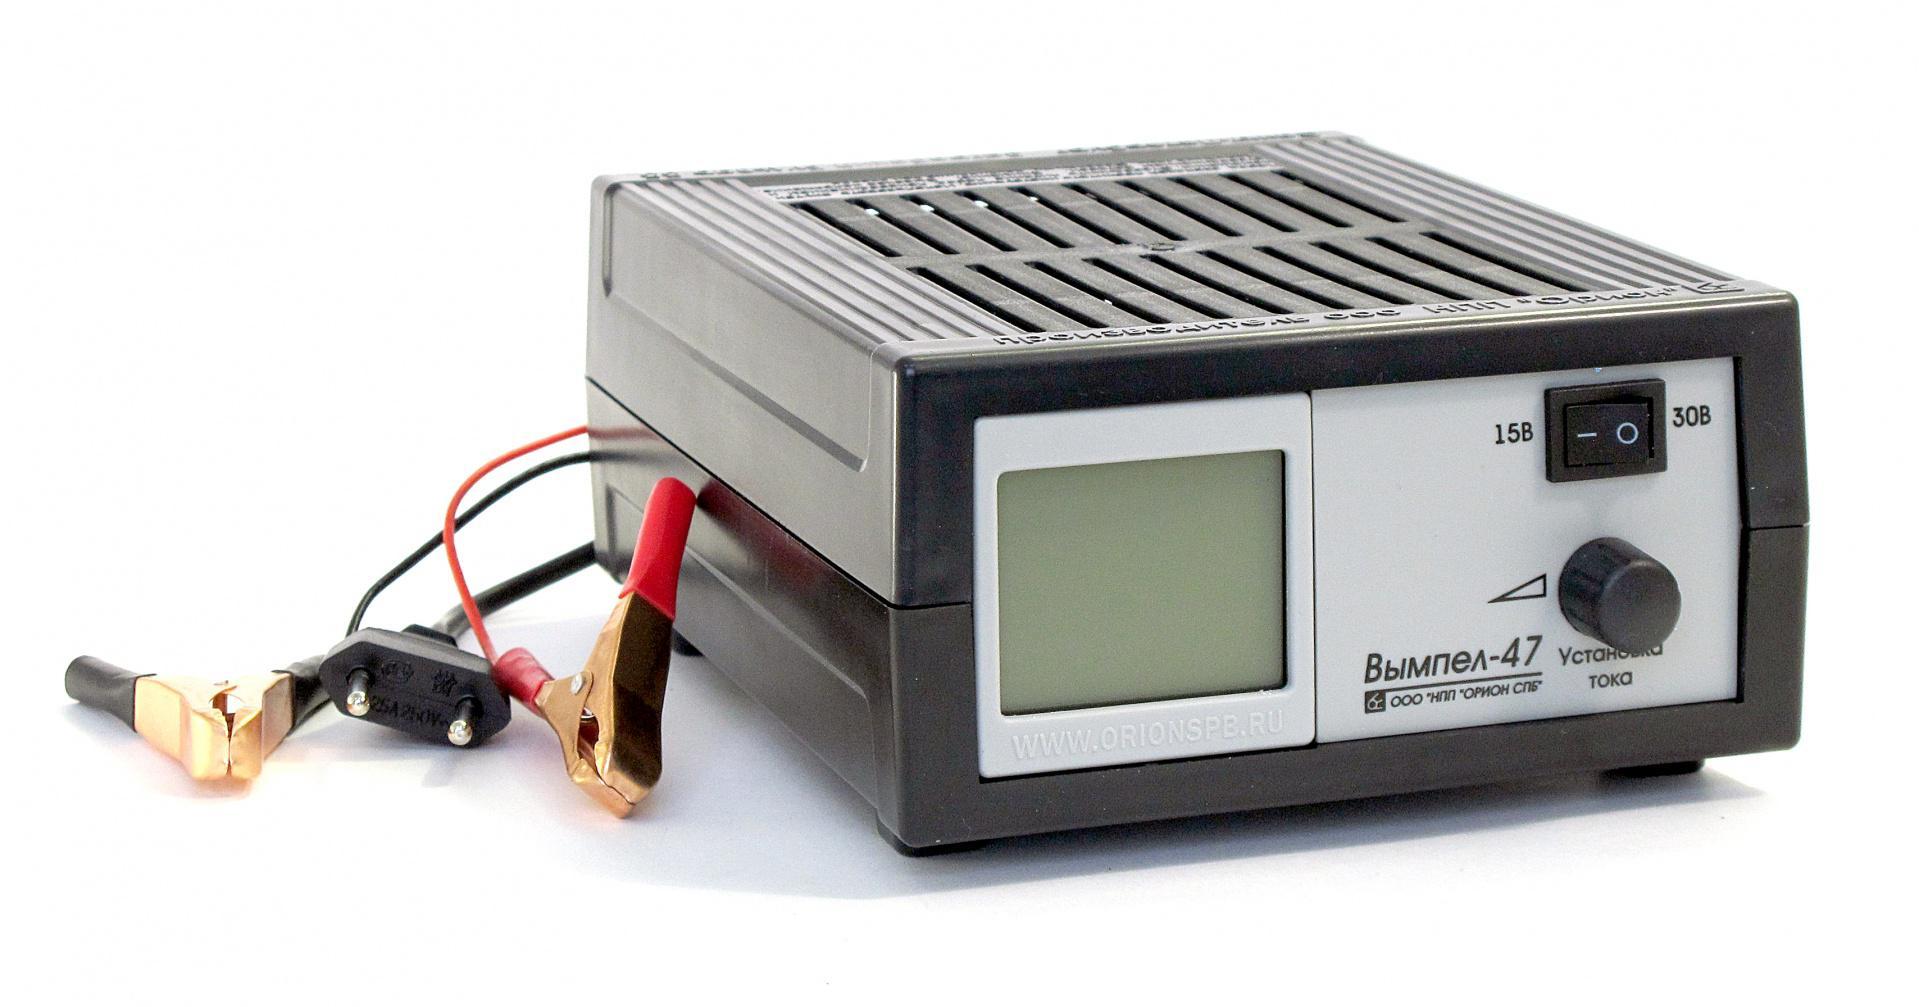 Фото - Зарядное устройство ВЫМПЕЛ 47 зарядные устройства для планшетов